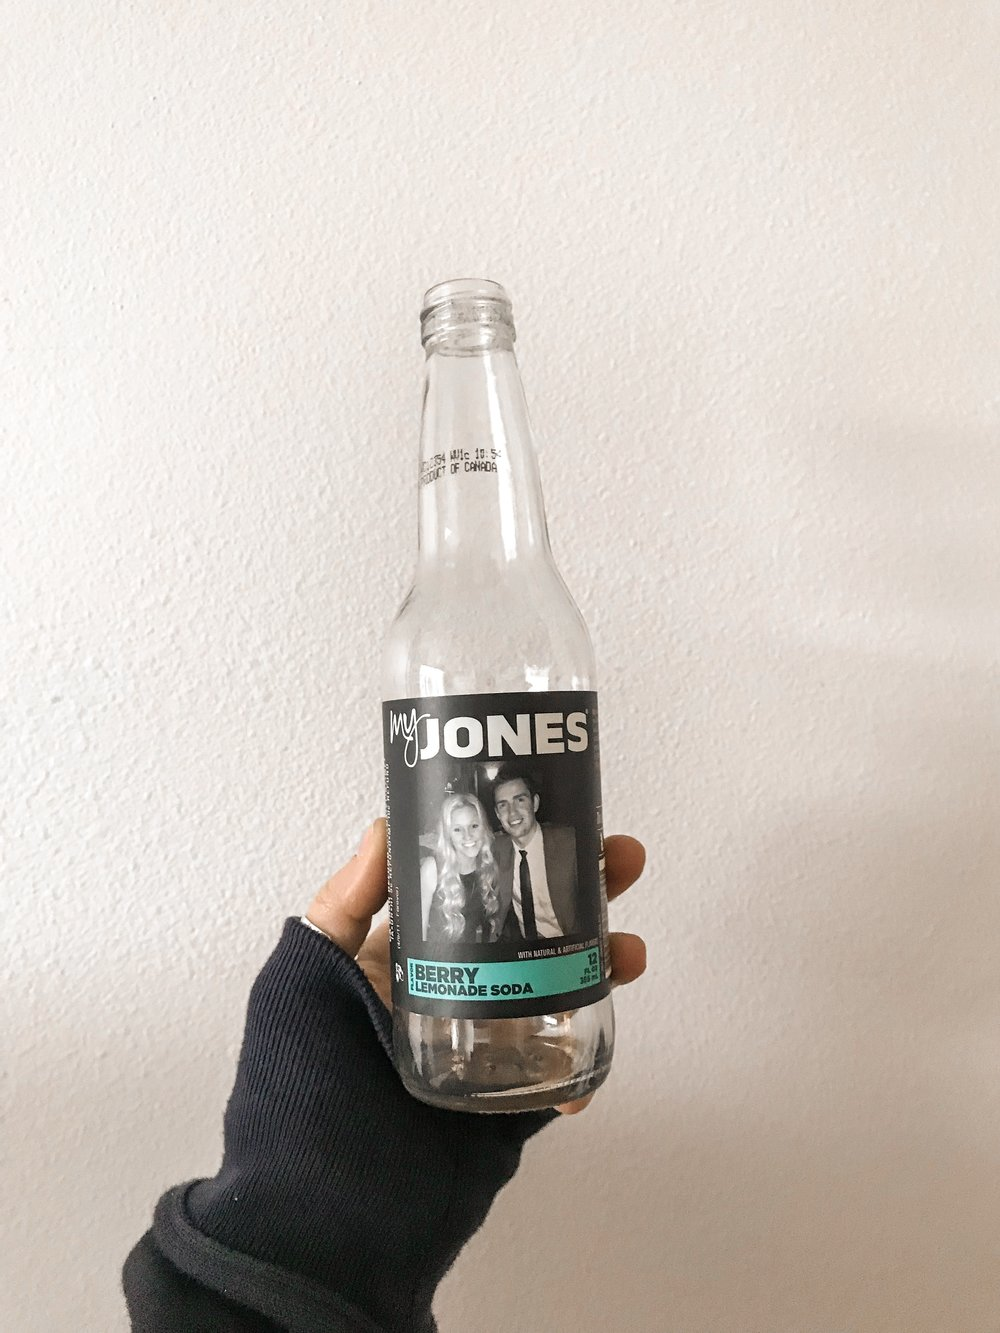 Bre Sheppard Thoughtful Gift Giving Ideas : Valentine's Day - Jones Soda.JPG